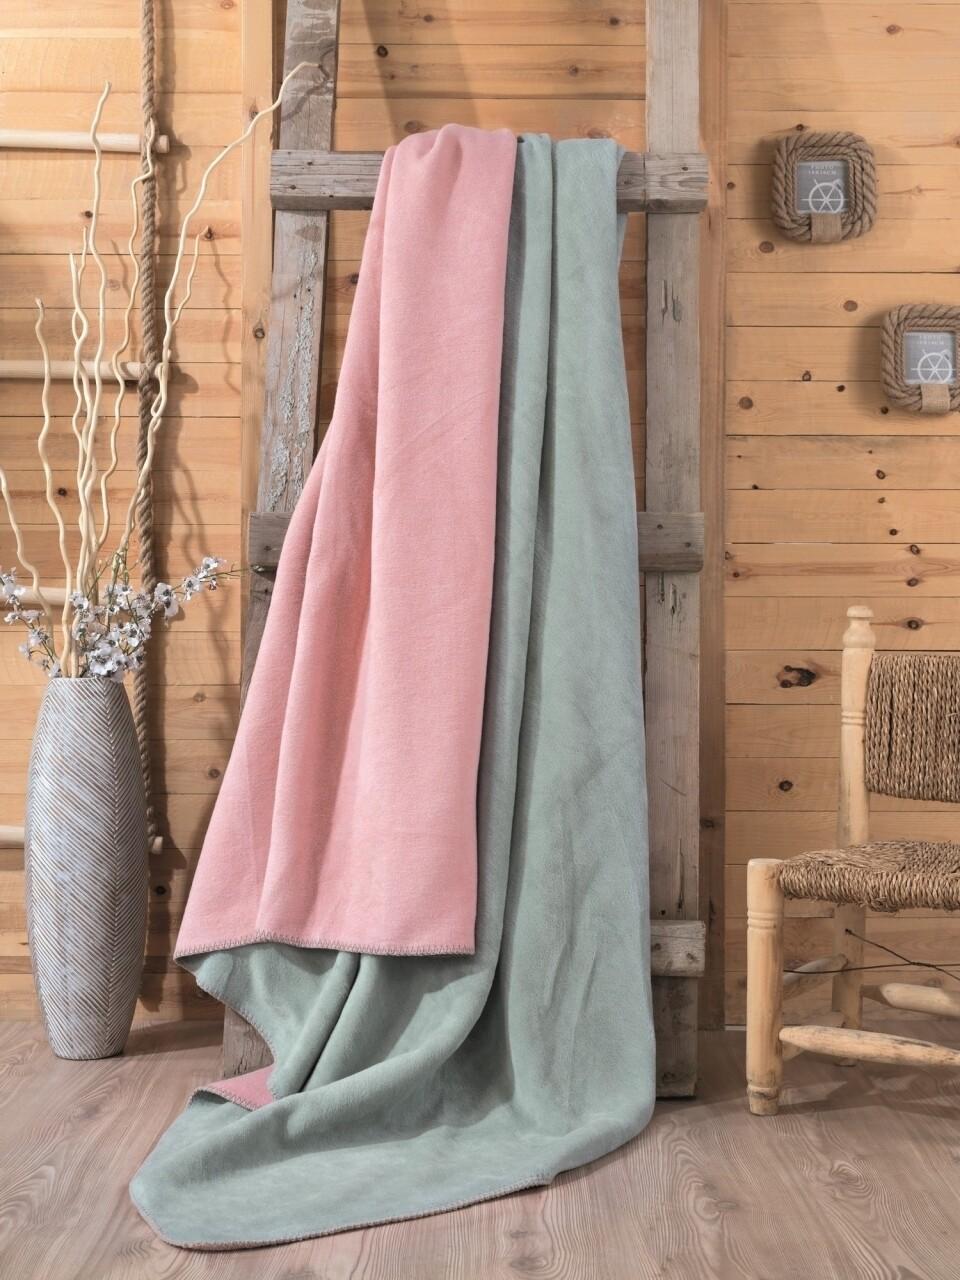 Patura pentru pat dublu din bumbac si acrylic, 200x200 cm, Cotton Box, roz/menta